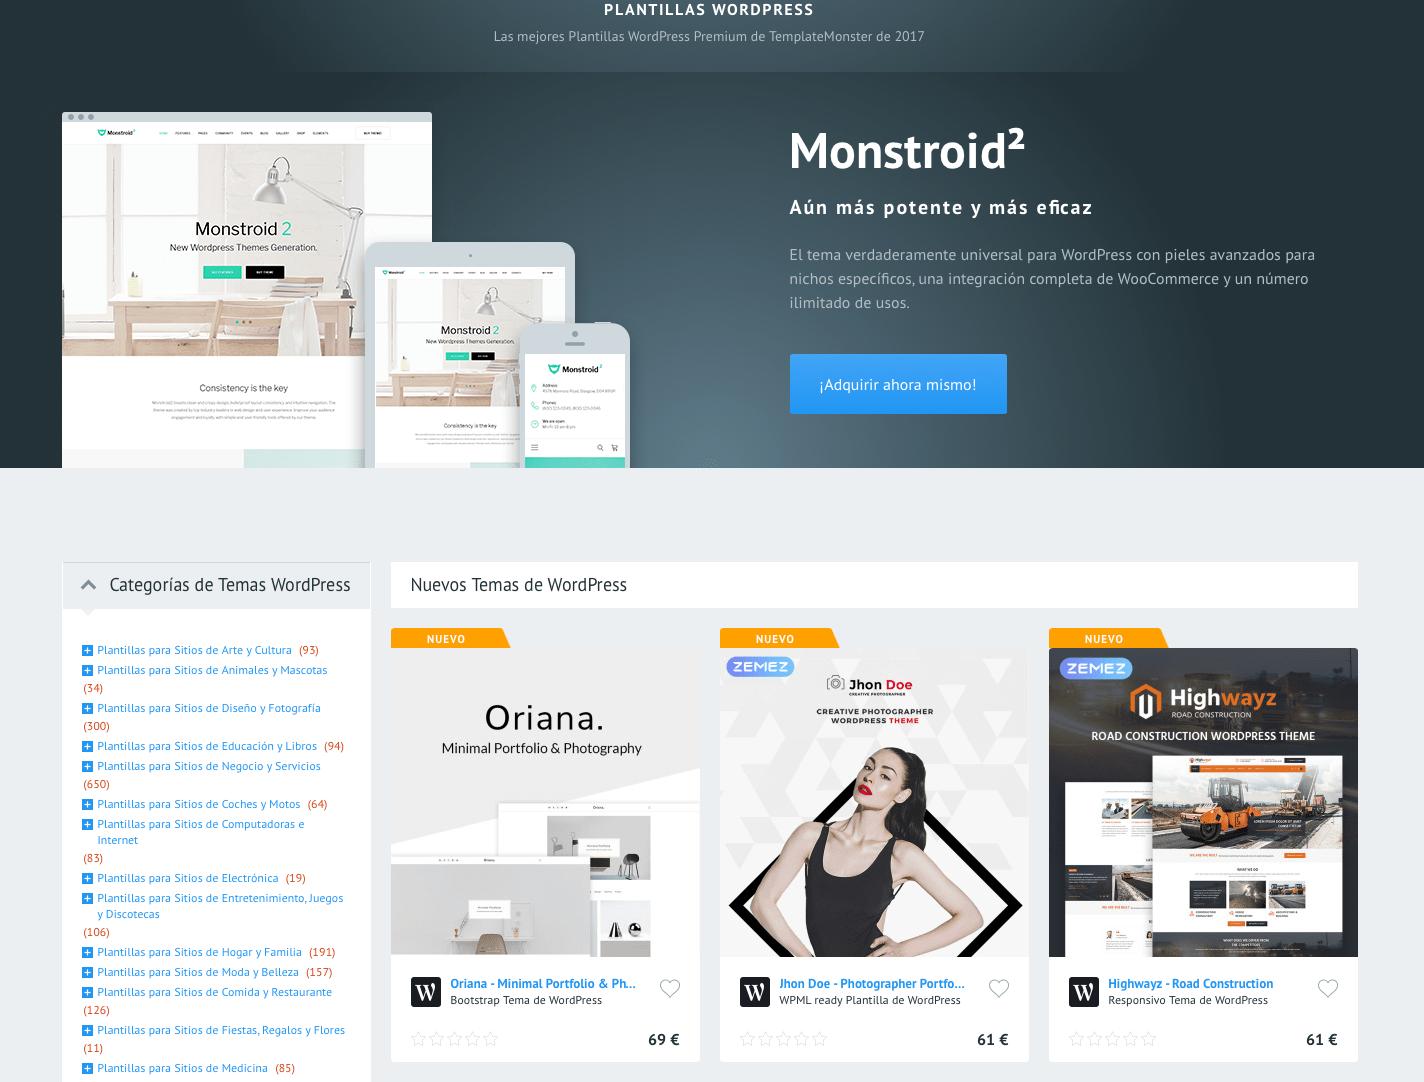 template-monster-temas-para-wordpress